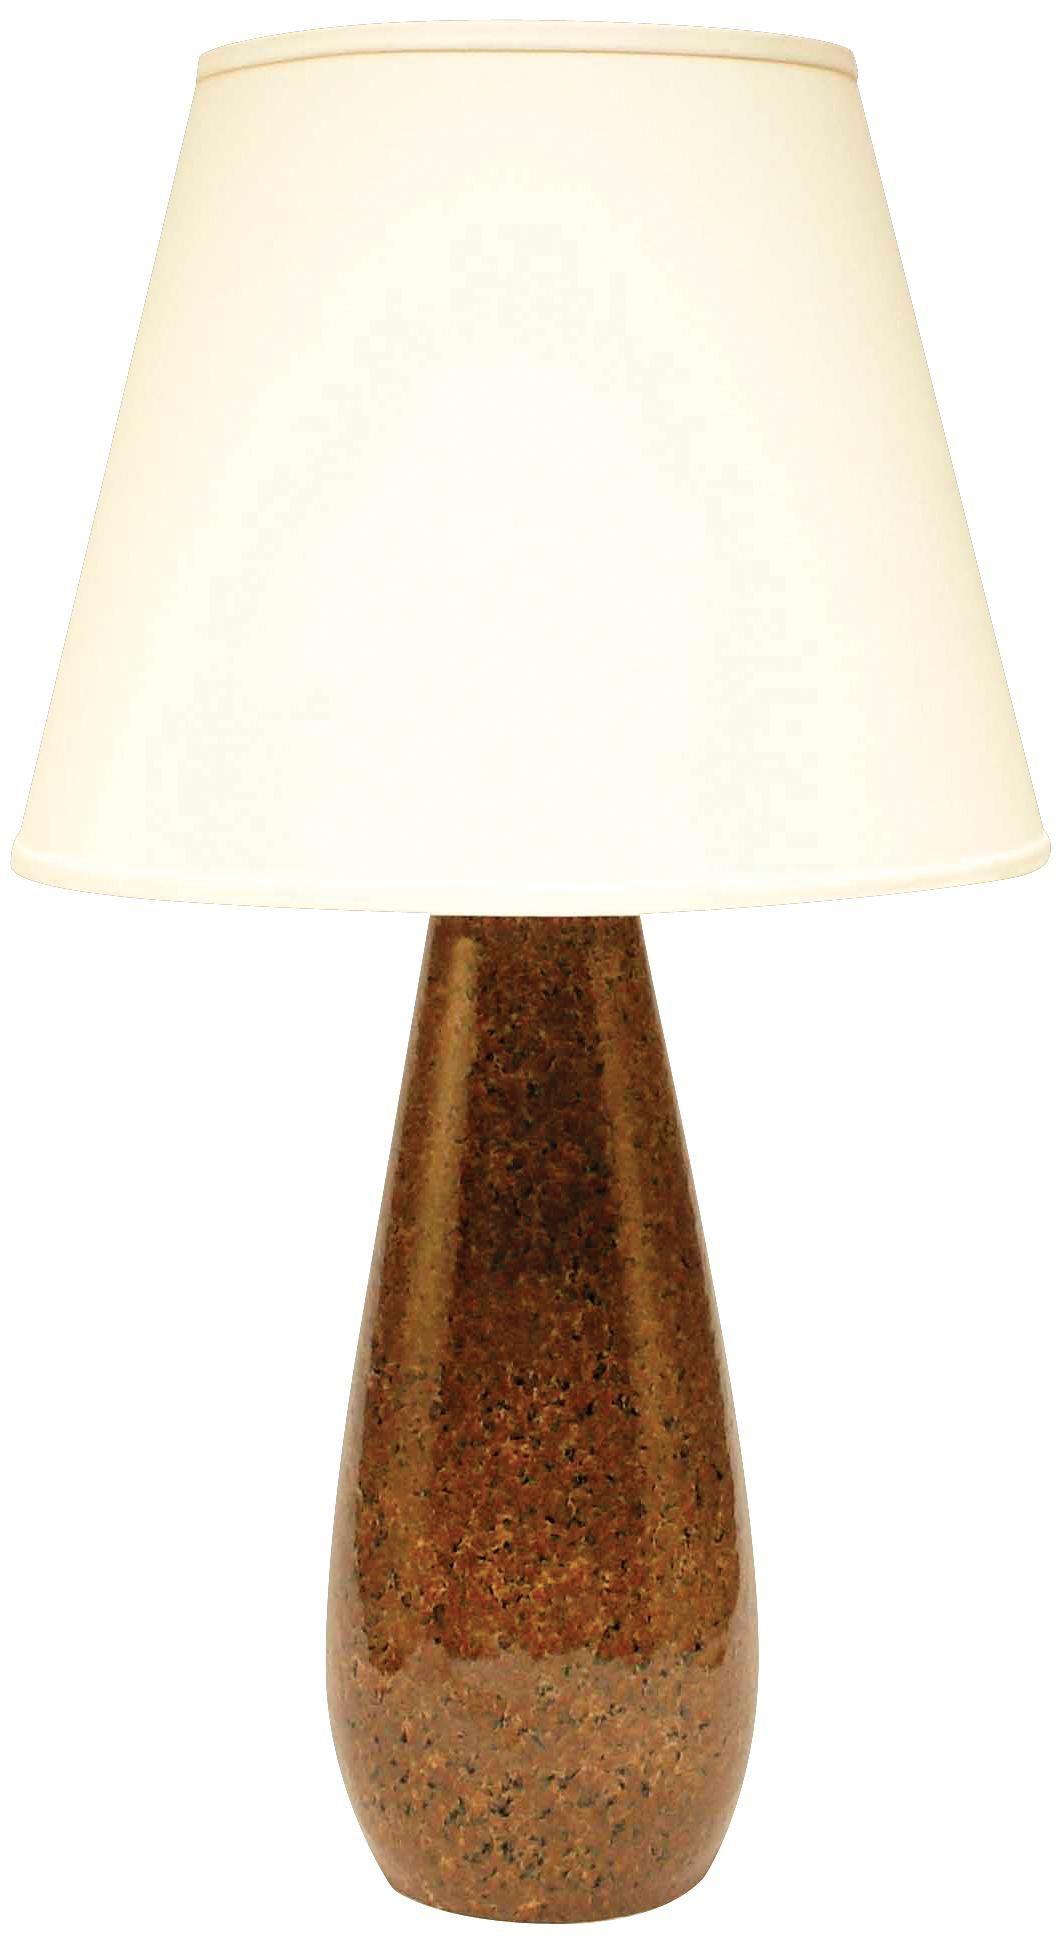 Haeger Potteries Mahogany Stone Ceramic Tear Drop Table Lamp P1952 Lamps Plus Table Lamp Lamp Ceramic Lamp Base